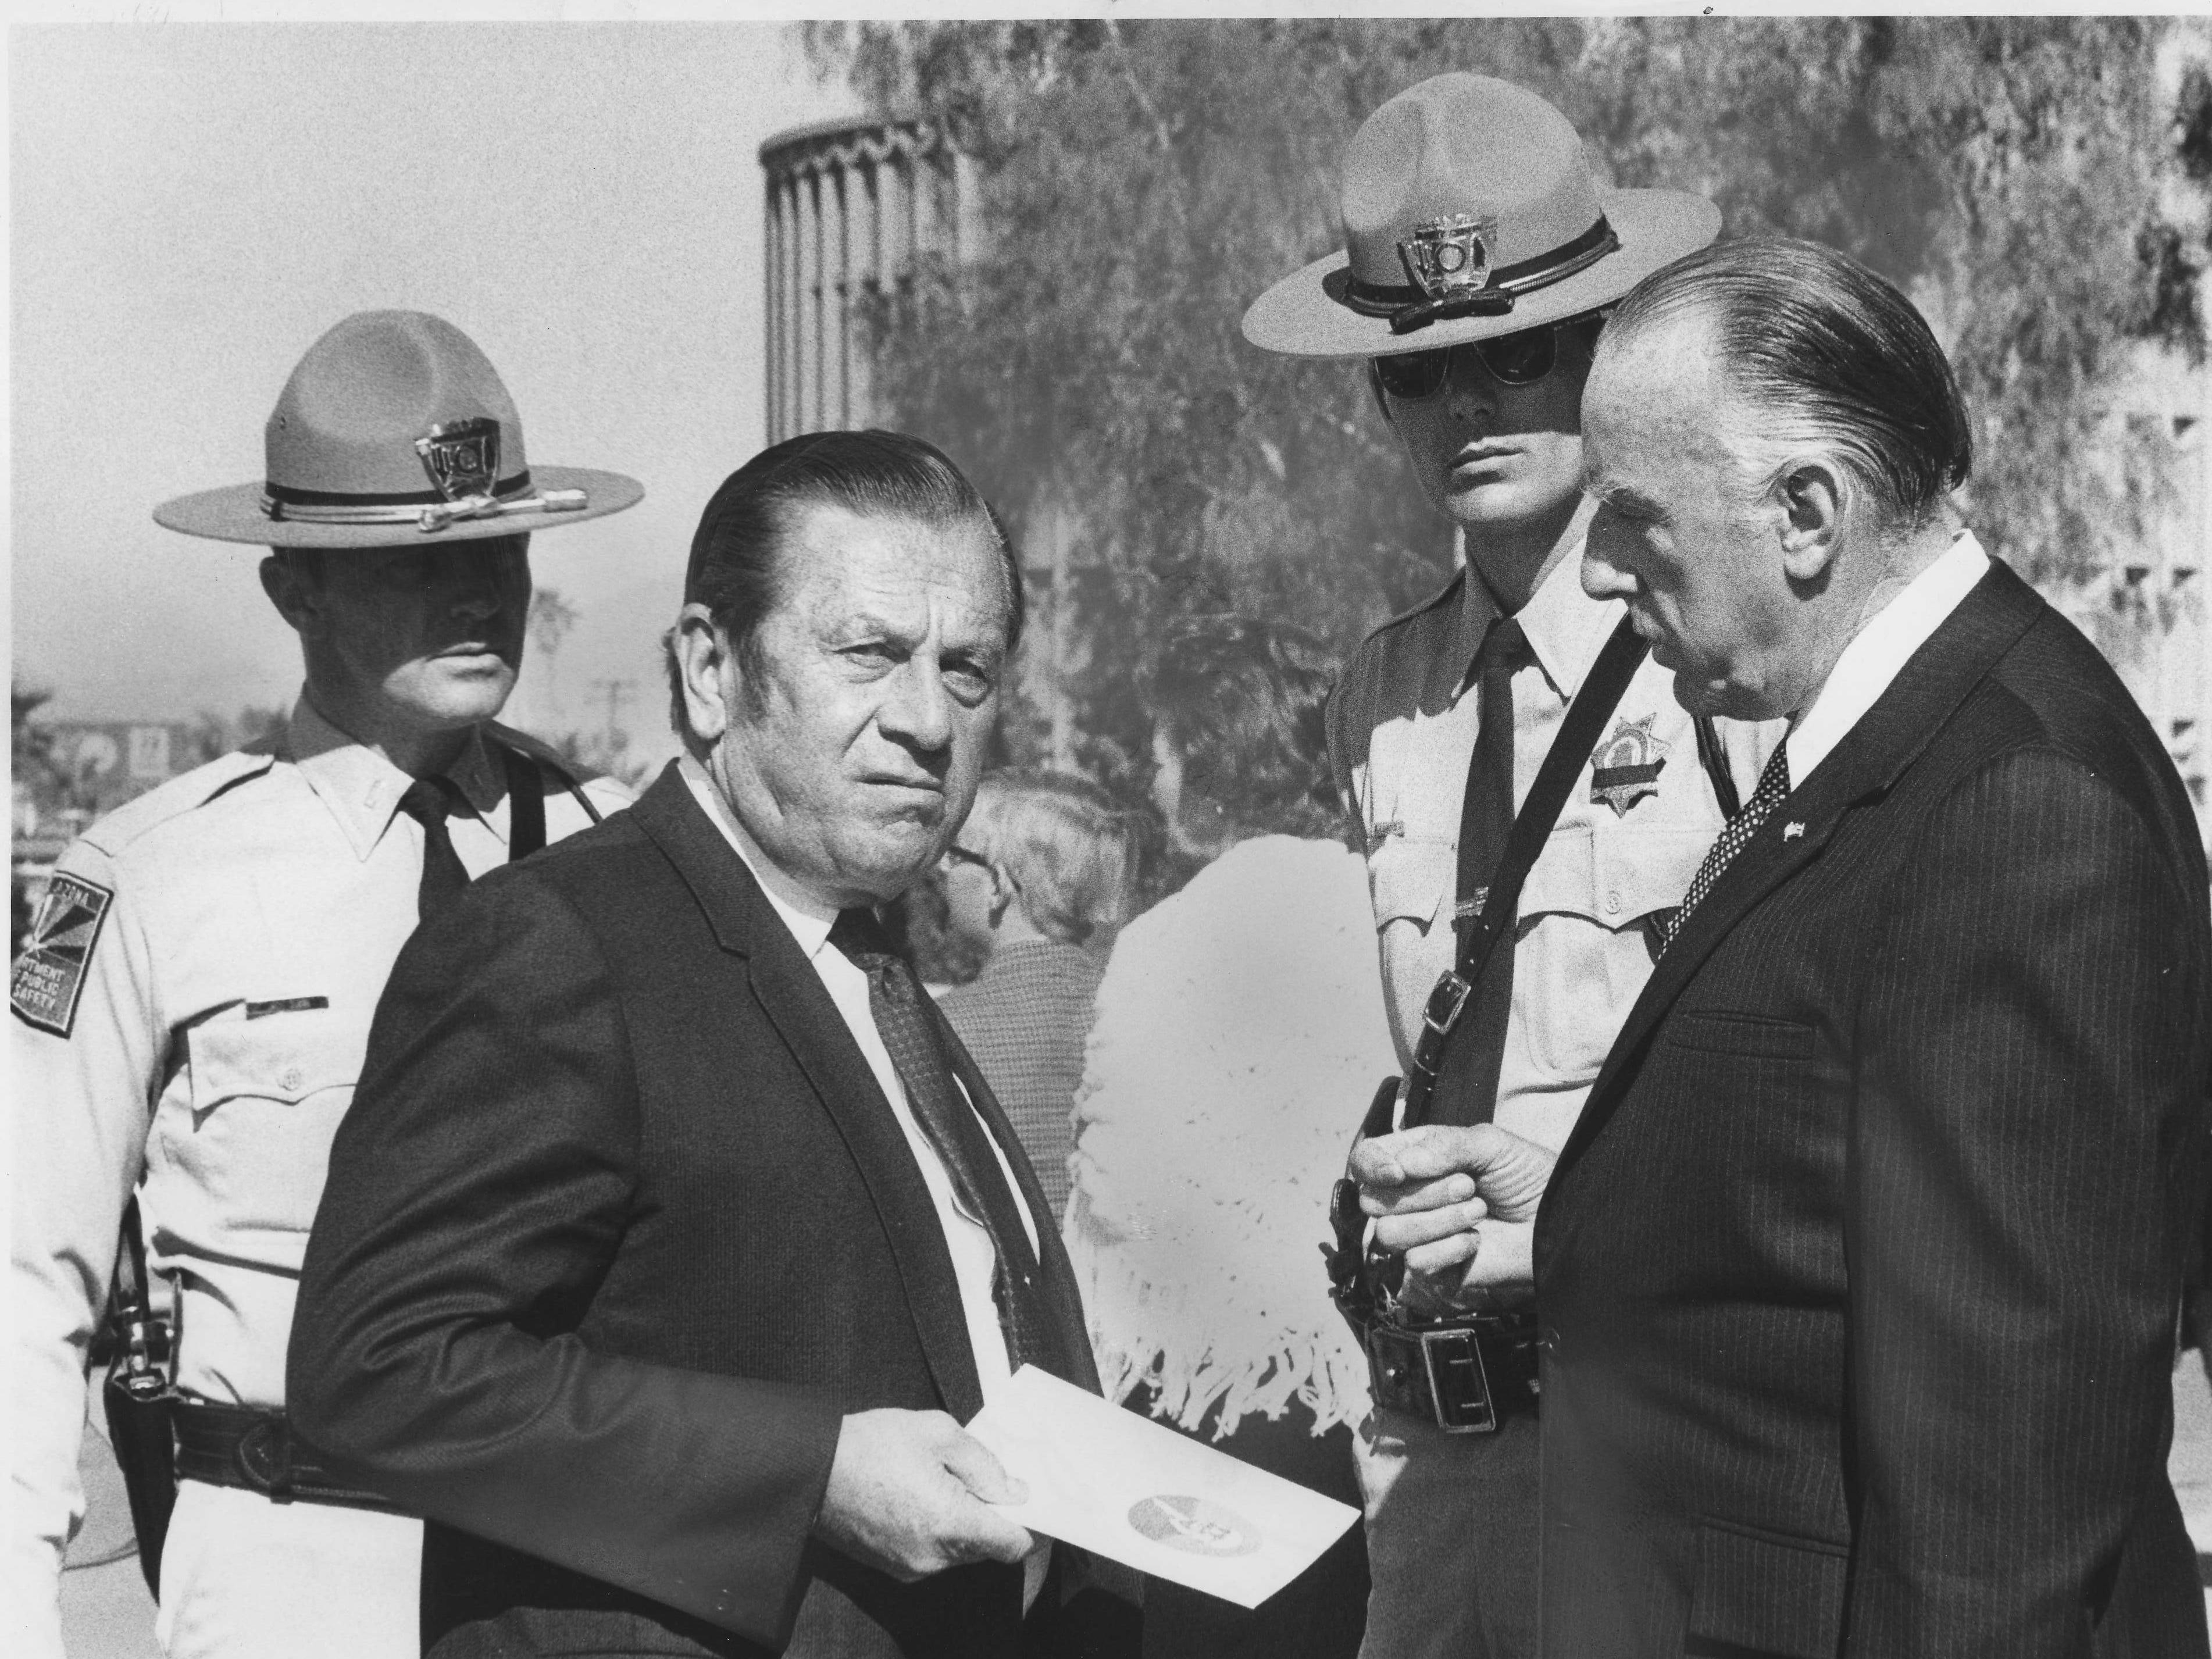 Attendees at the funeral of former U.S. Sen. Carl Hayden in Phoenix in 1972.